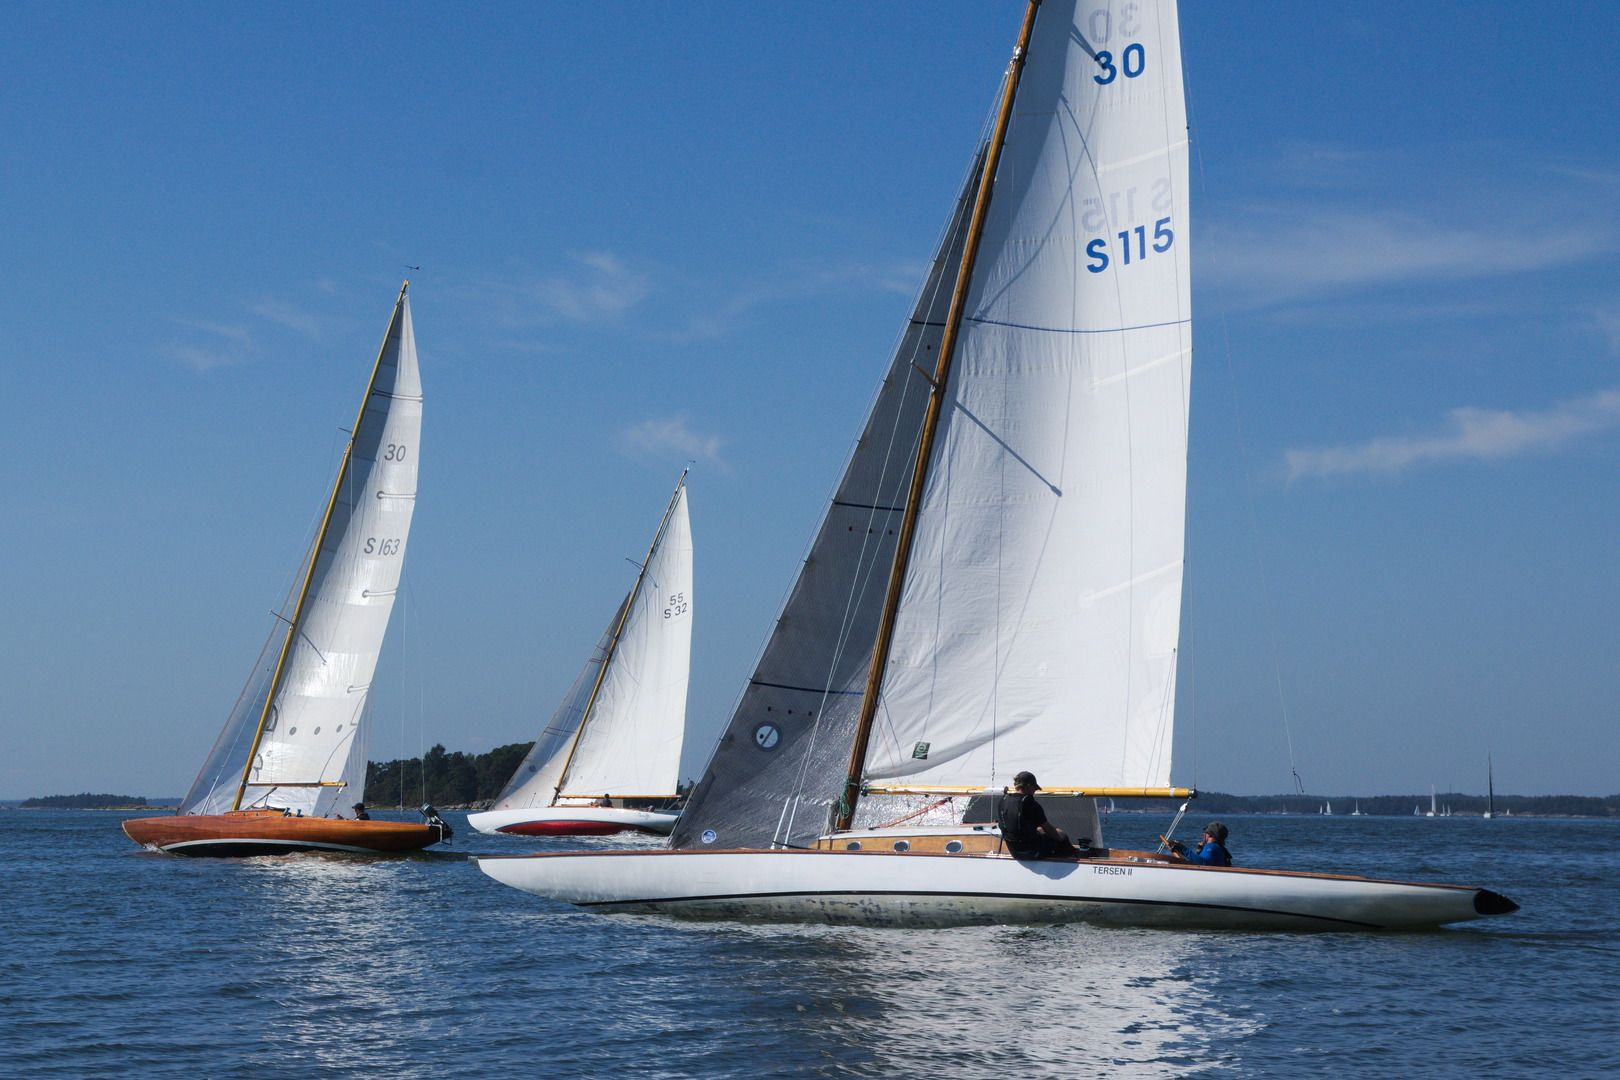 06 Strackbog Jpg 1 620 1 080 Pixels Classic Sailing Sailing Yacht Sailing